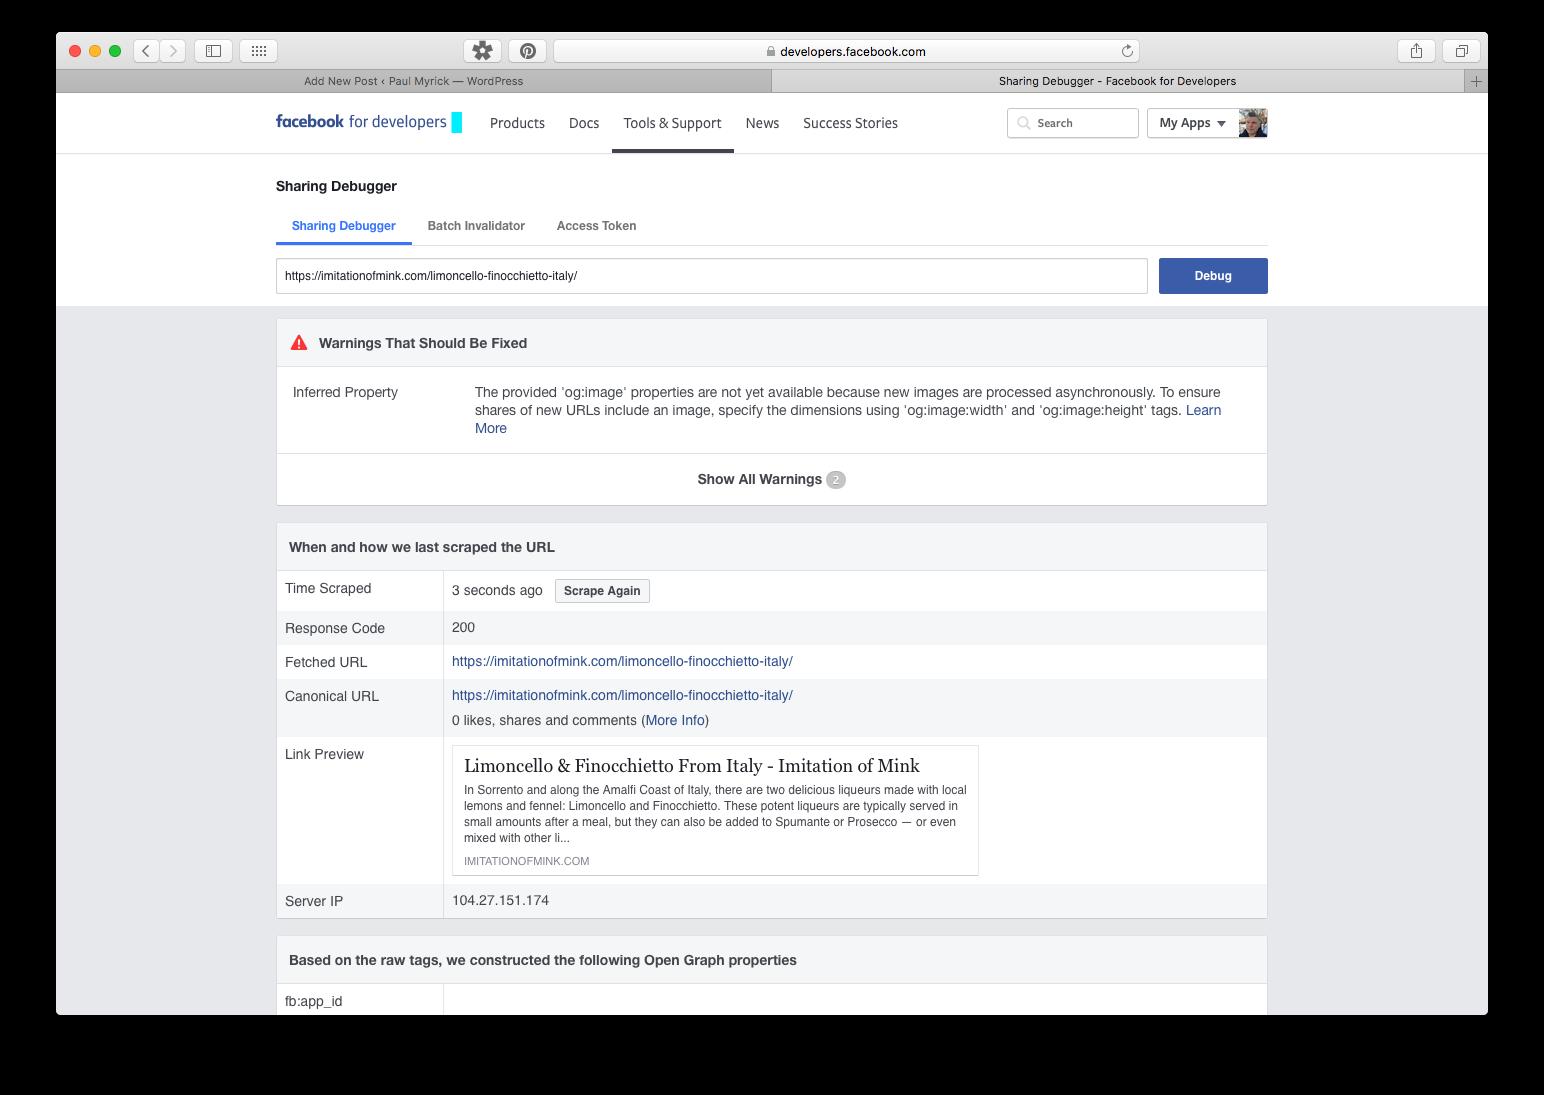 Facebook's Sharing Debugger